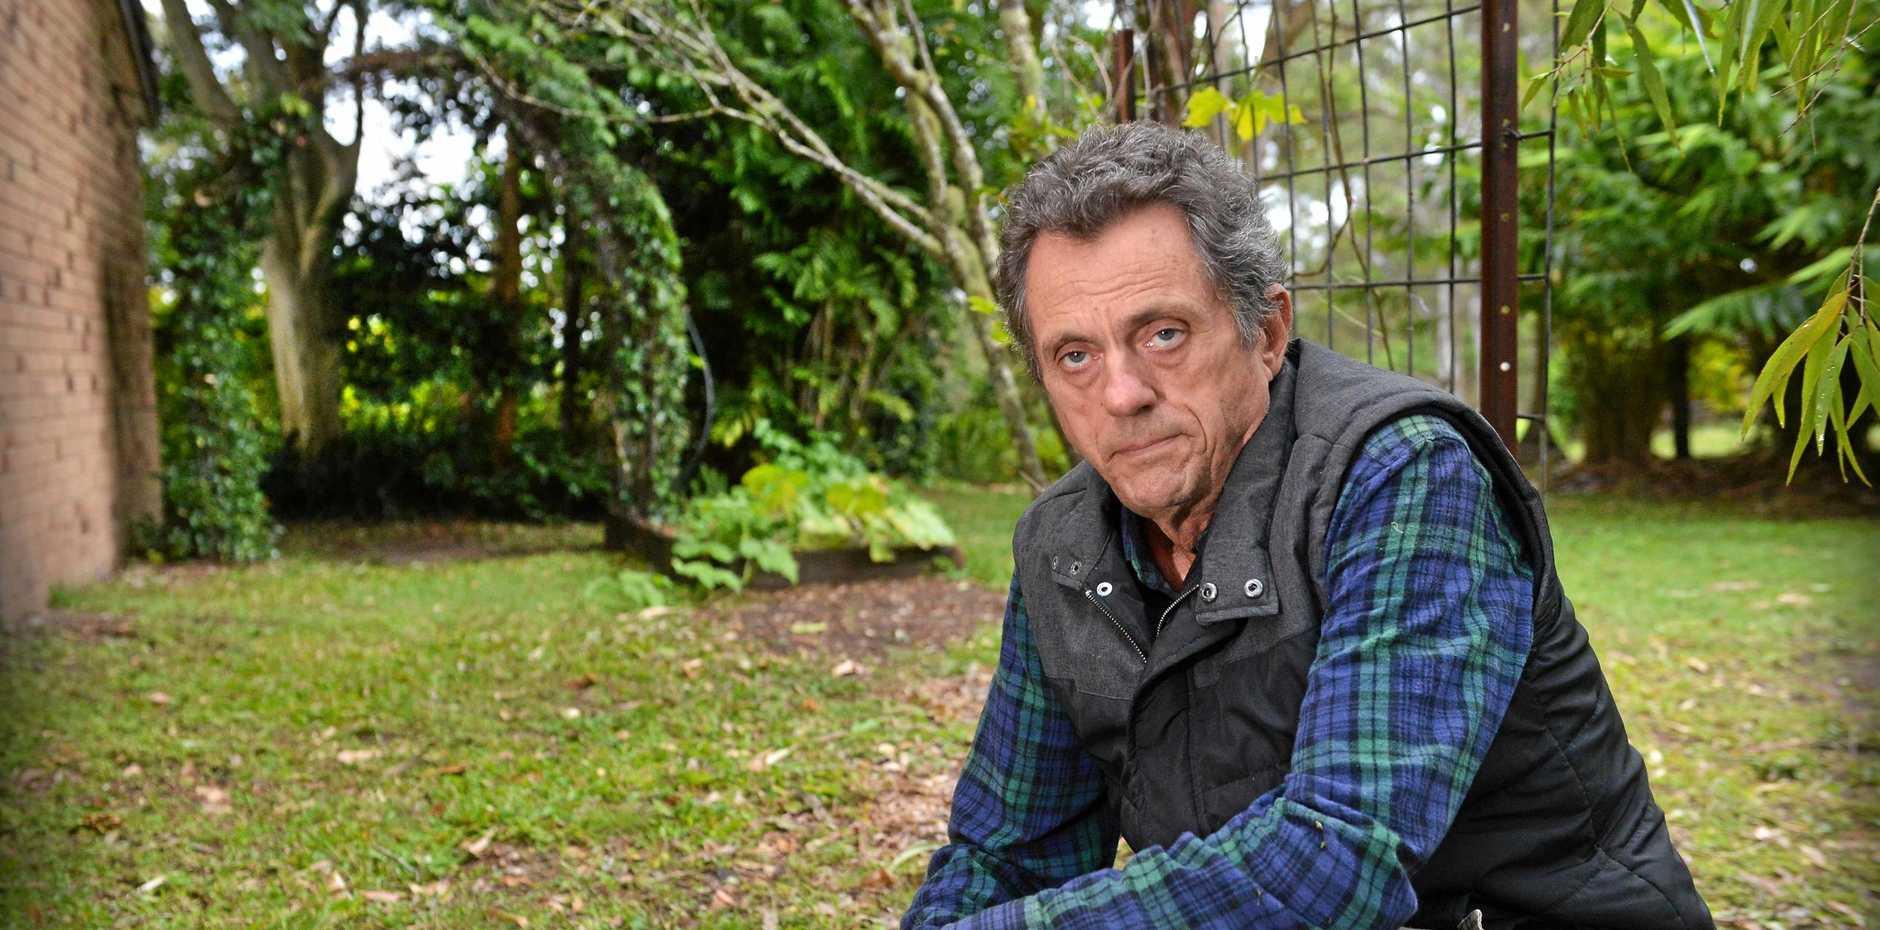 Yandina-based naturalist Greg Roberts